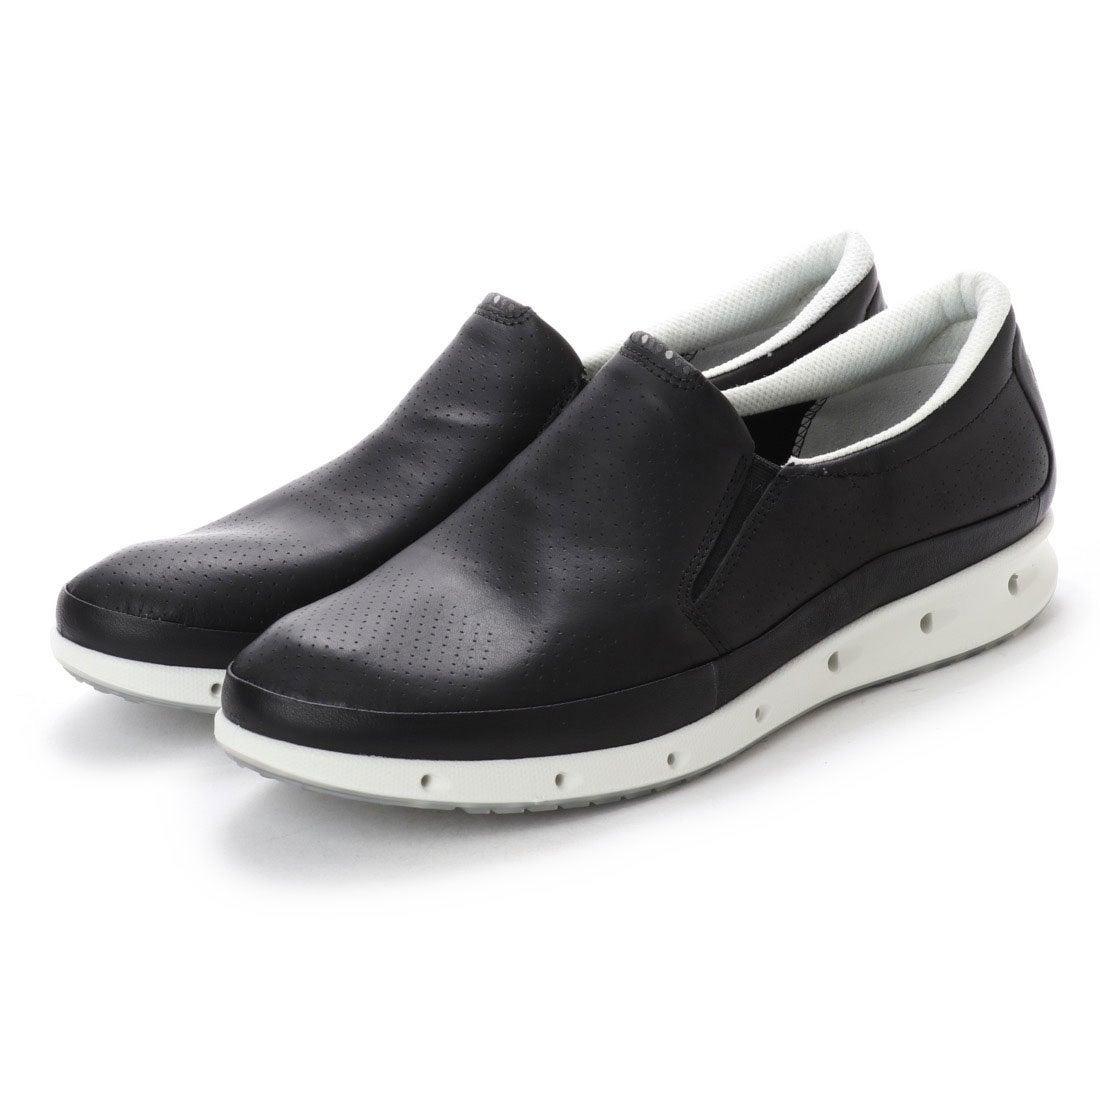 wholesale dealer 5f797 e9cbd Schuhe ECCO Damen Aquet Sneaker 207113